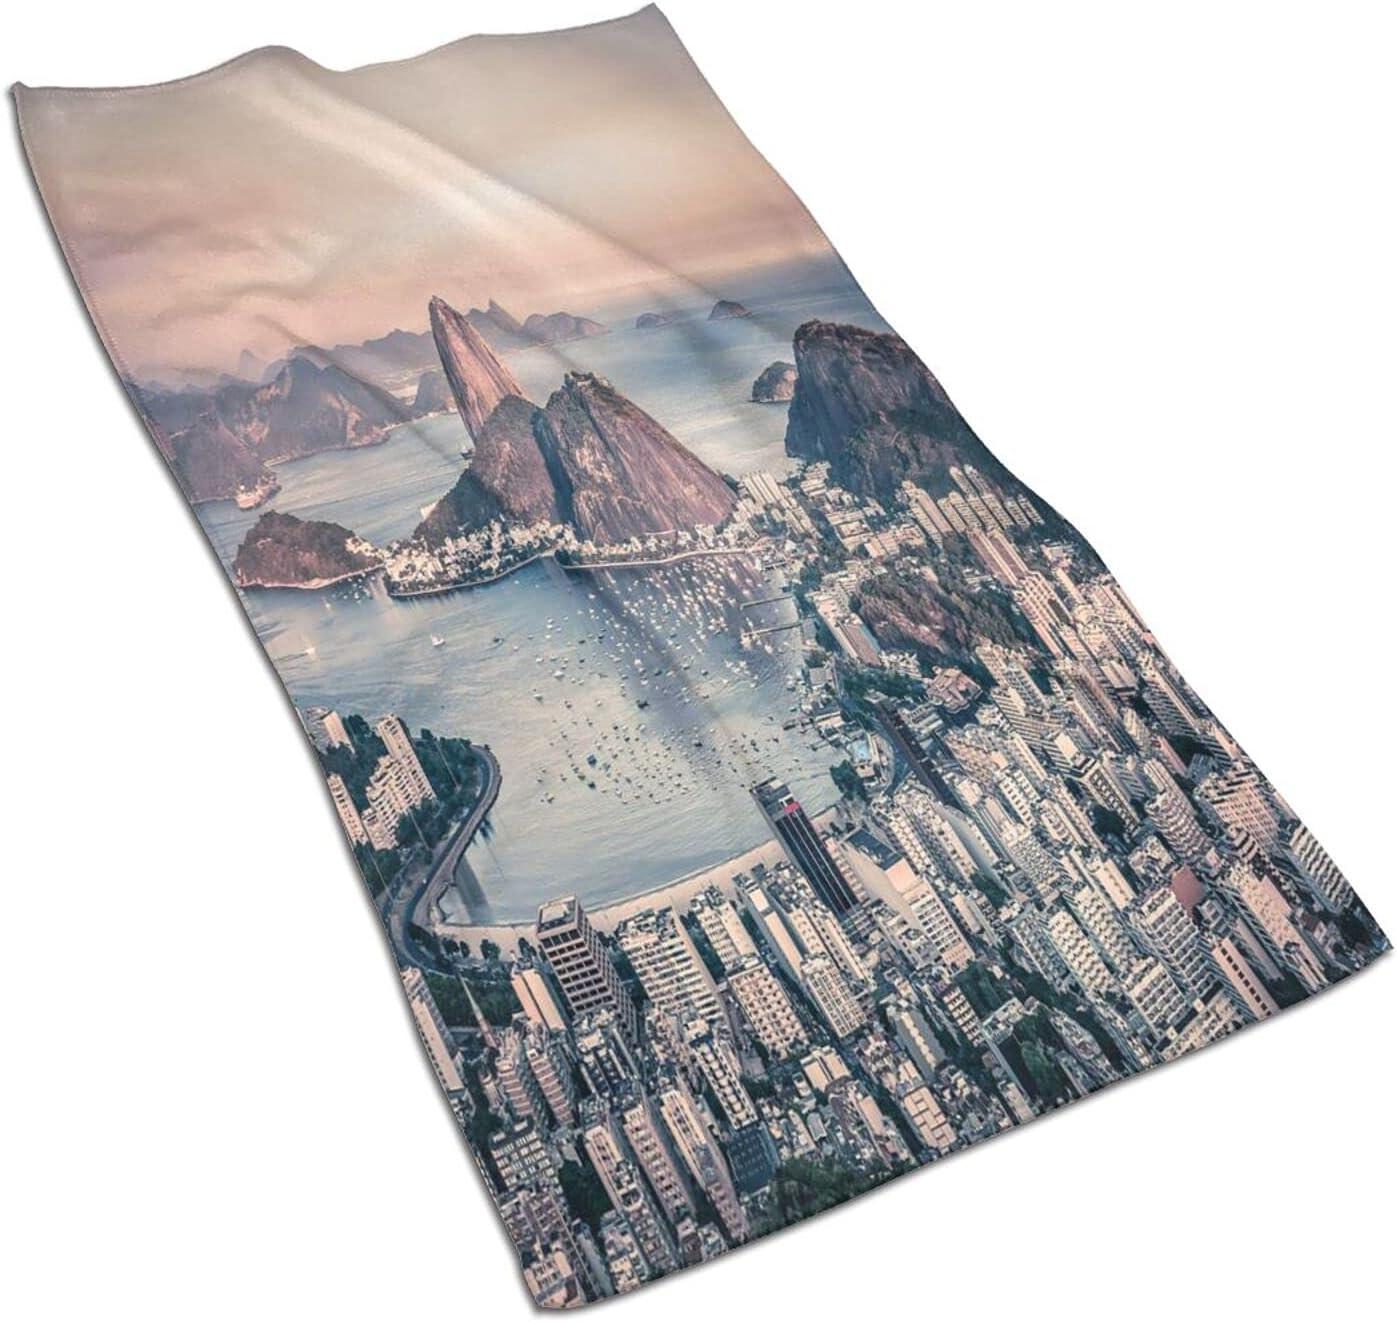 VINISATH 2 Pc Manufacturer regenerated product Hand Towels Set Sale Rio Coastline Janeiro Photo De Bra